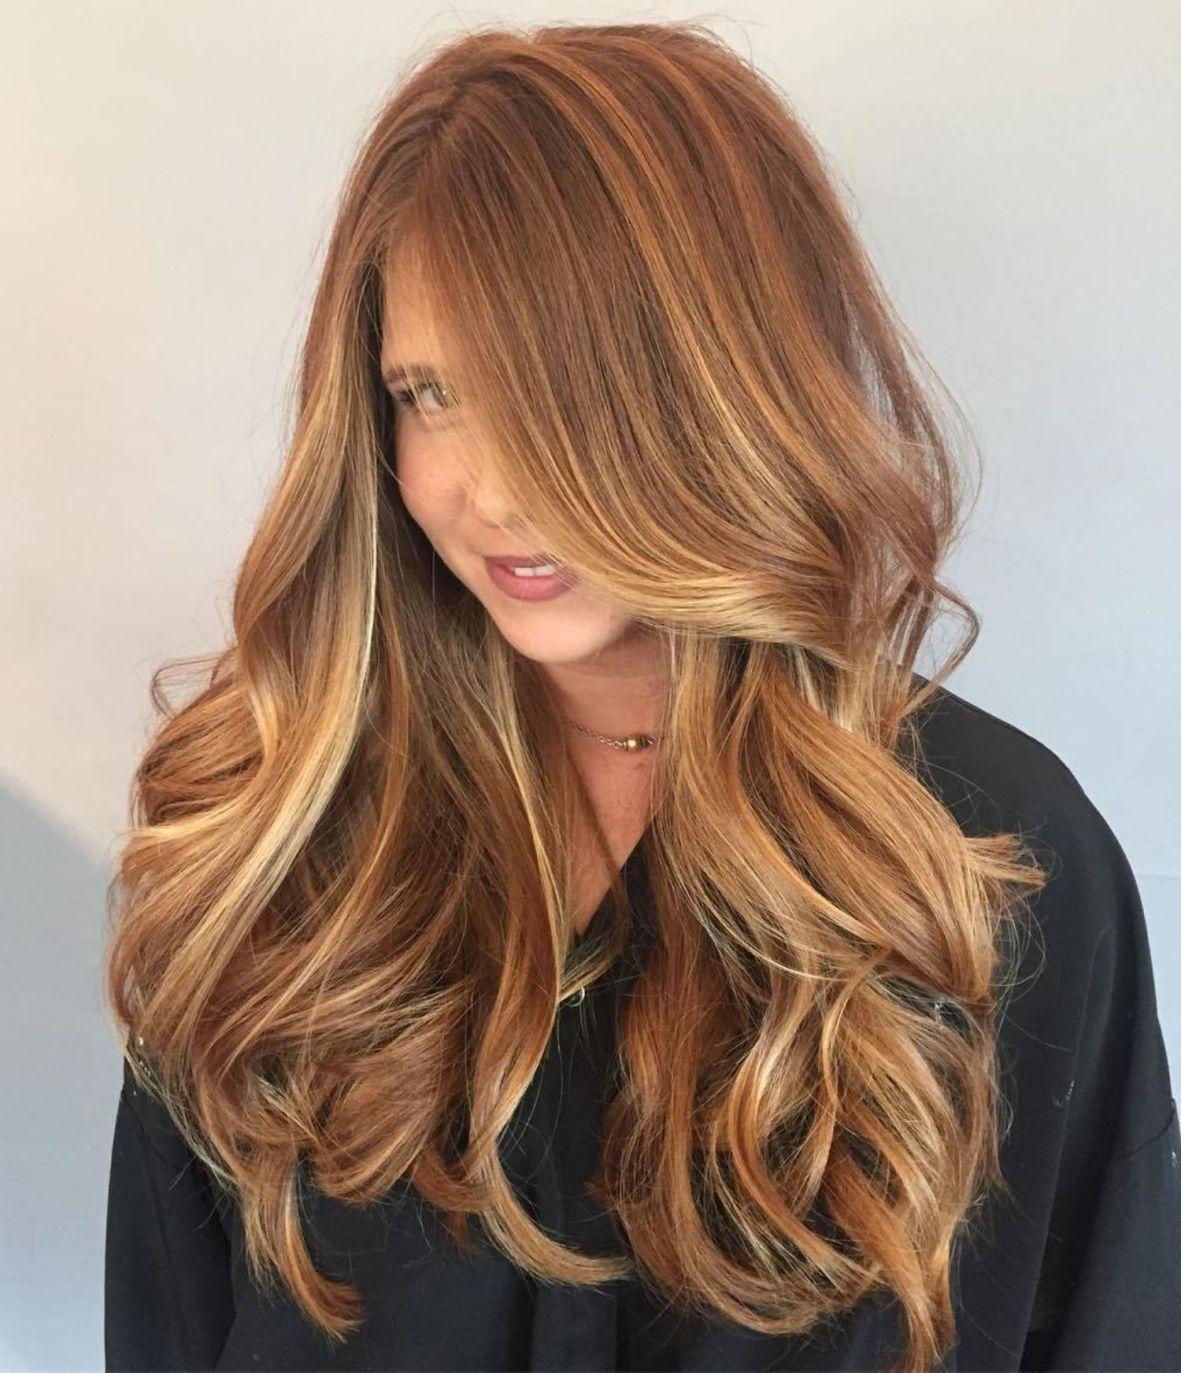 60 Best Strawberry Blonde Hair Ideas To Astonish Everyone Strawberry Blonde Hair Color Hair Color Caramel Strawberry Blonde Hair